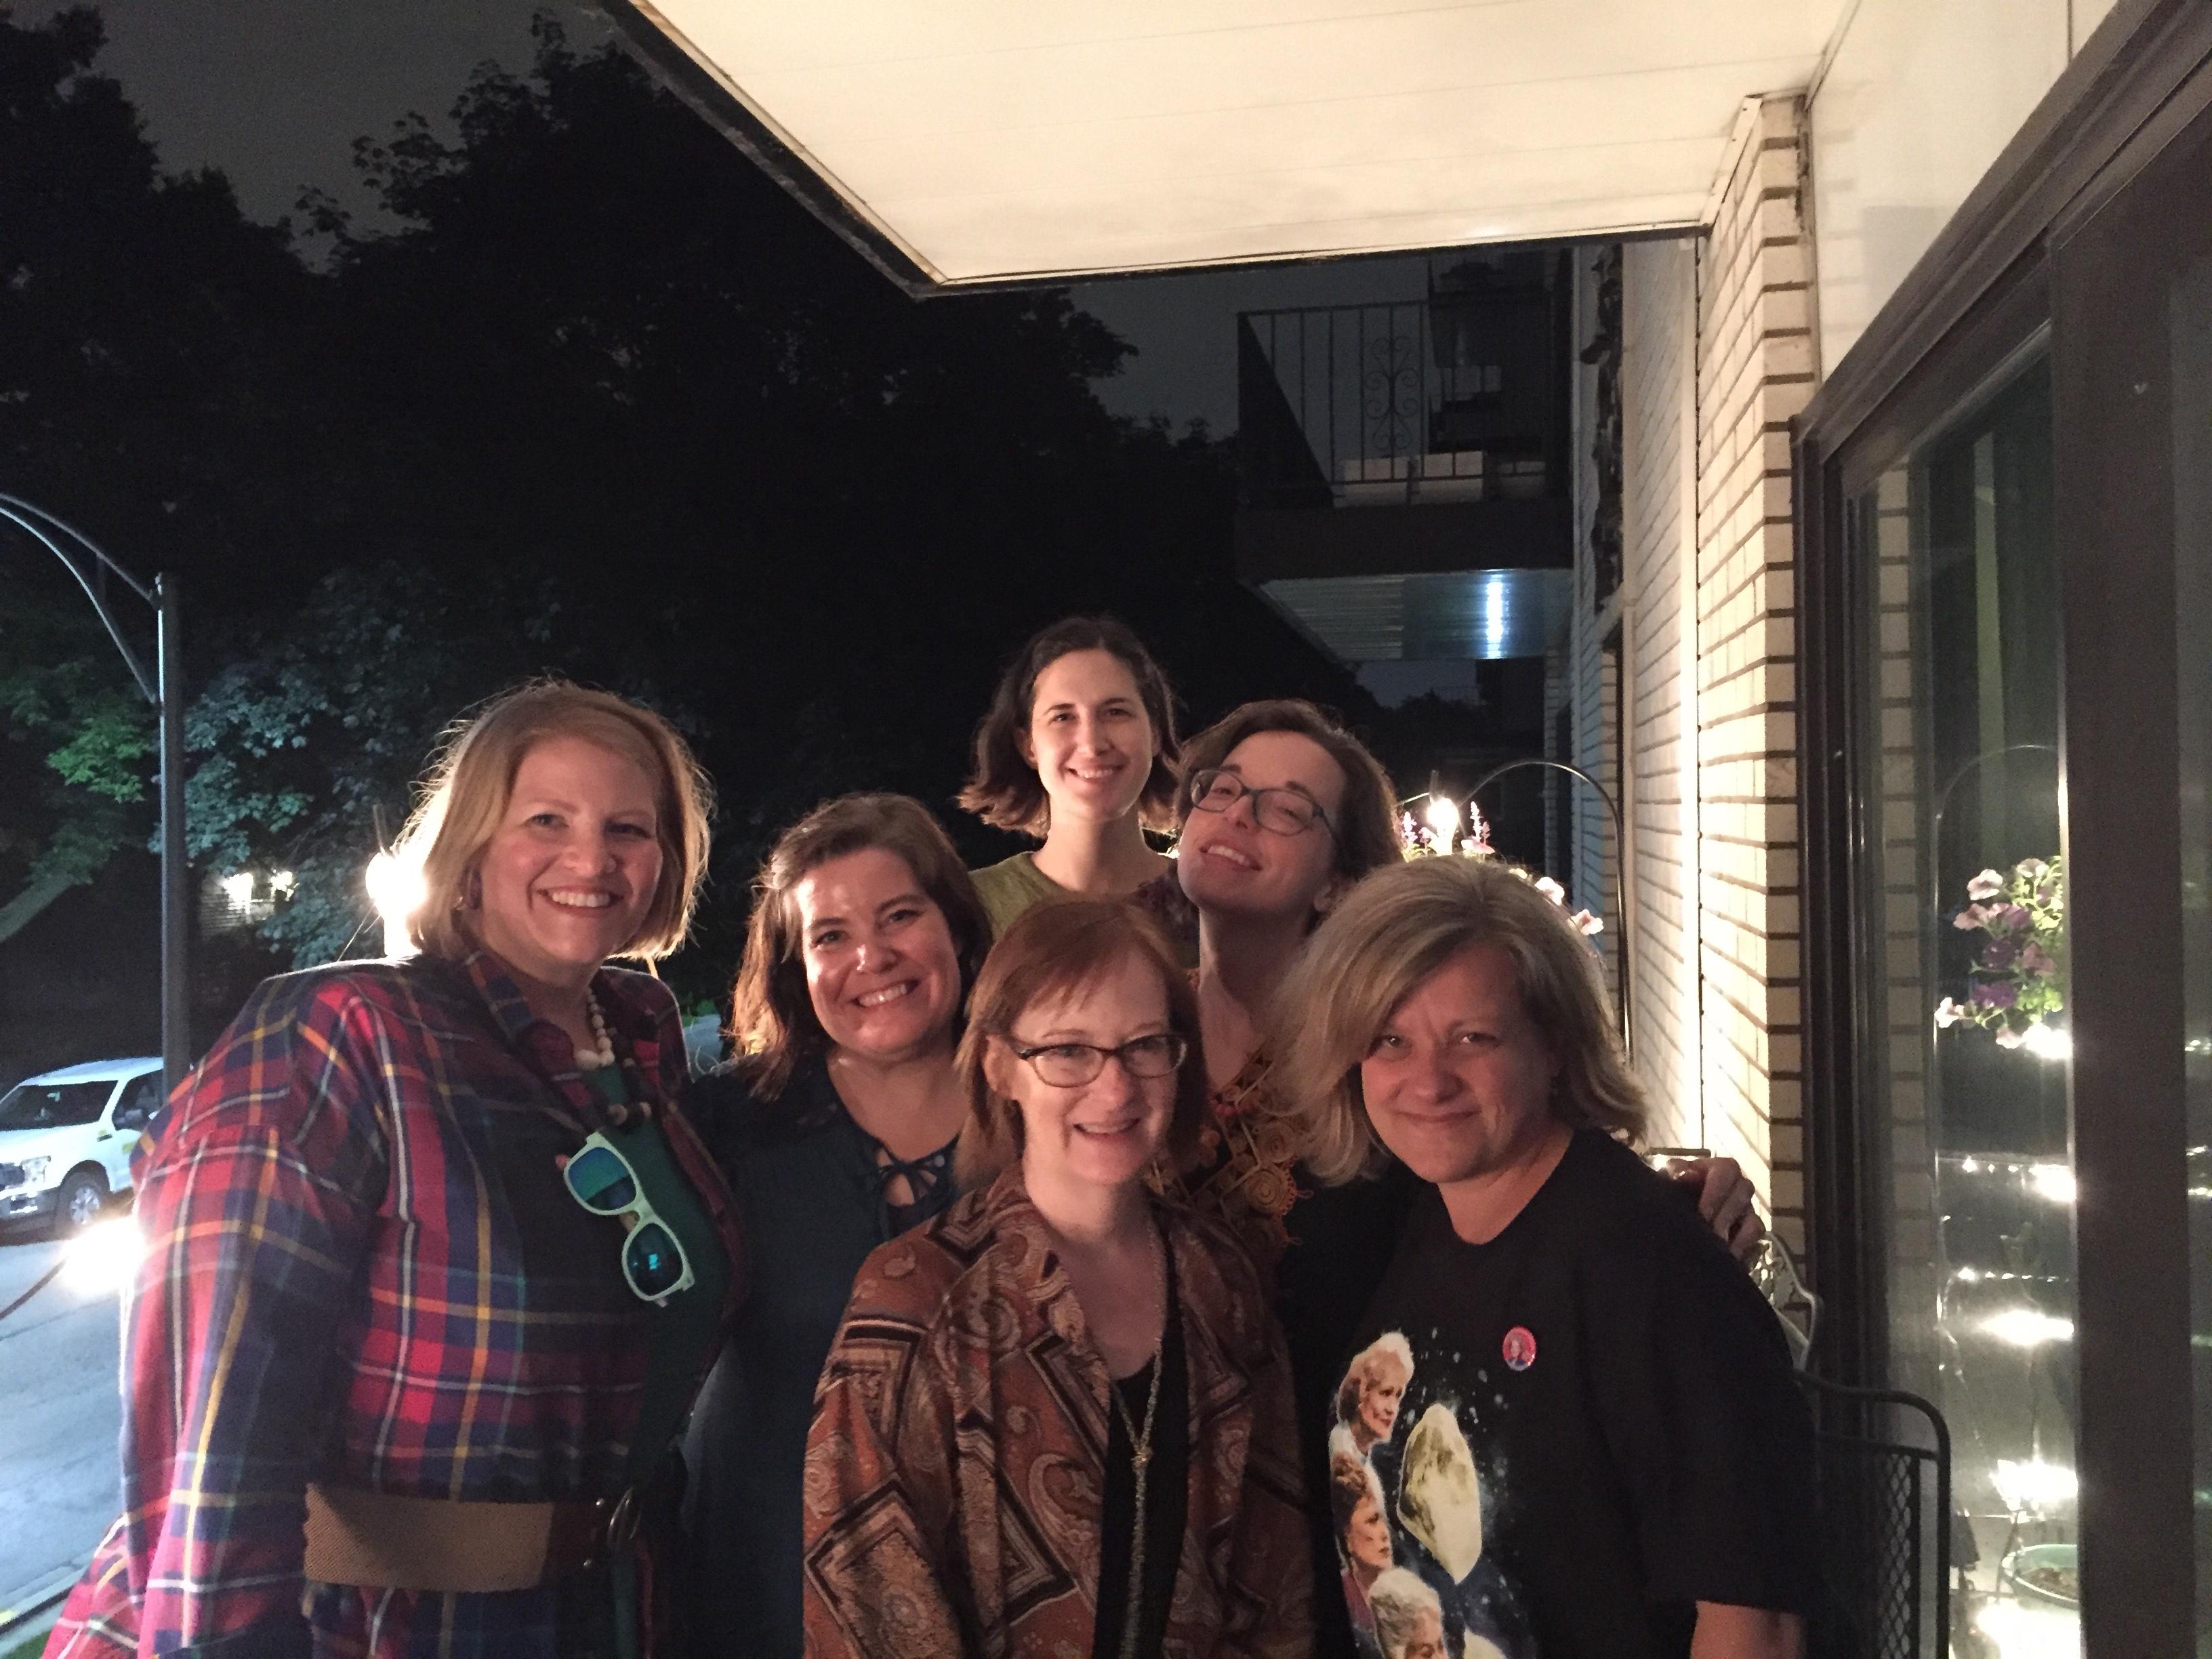 golden girls gala, friends on the lanai, golden girls party, kaftans, peignoirs